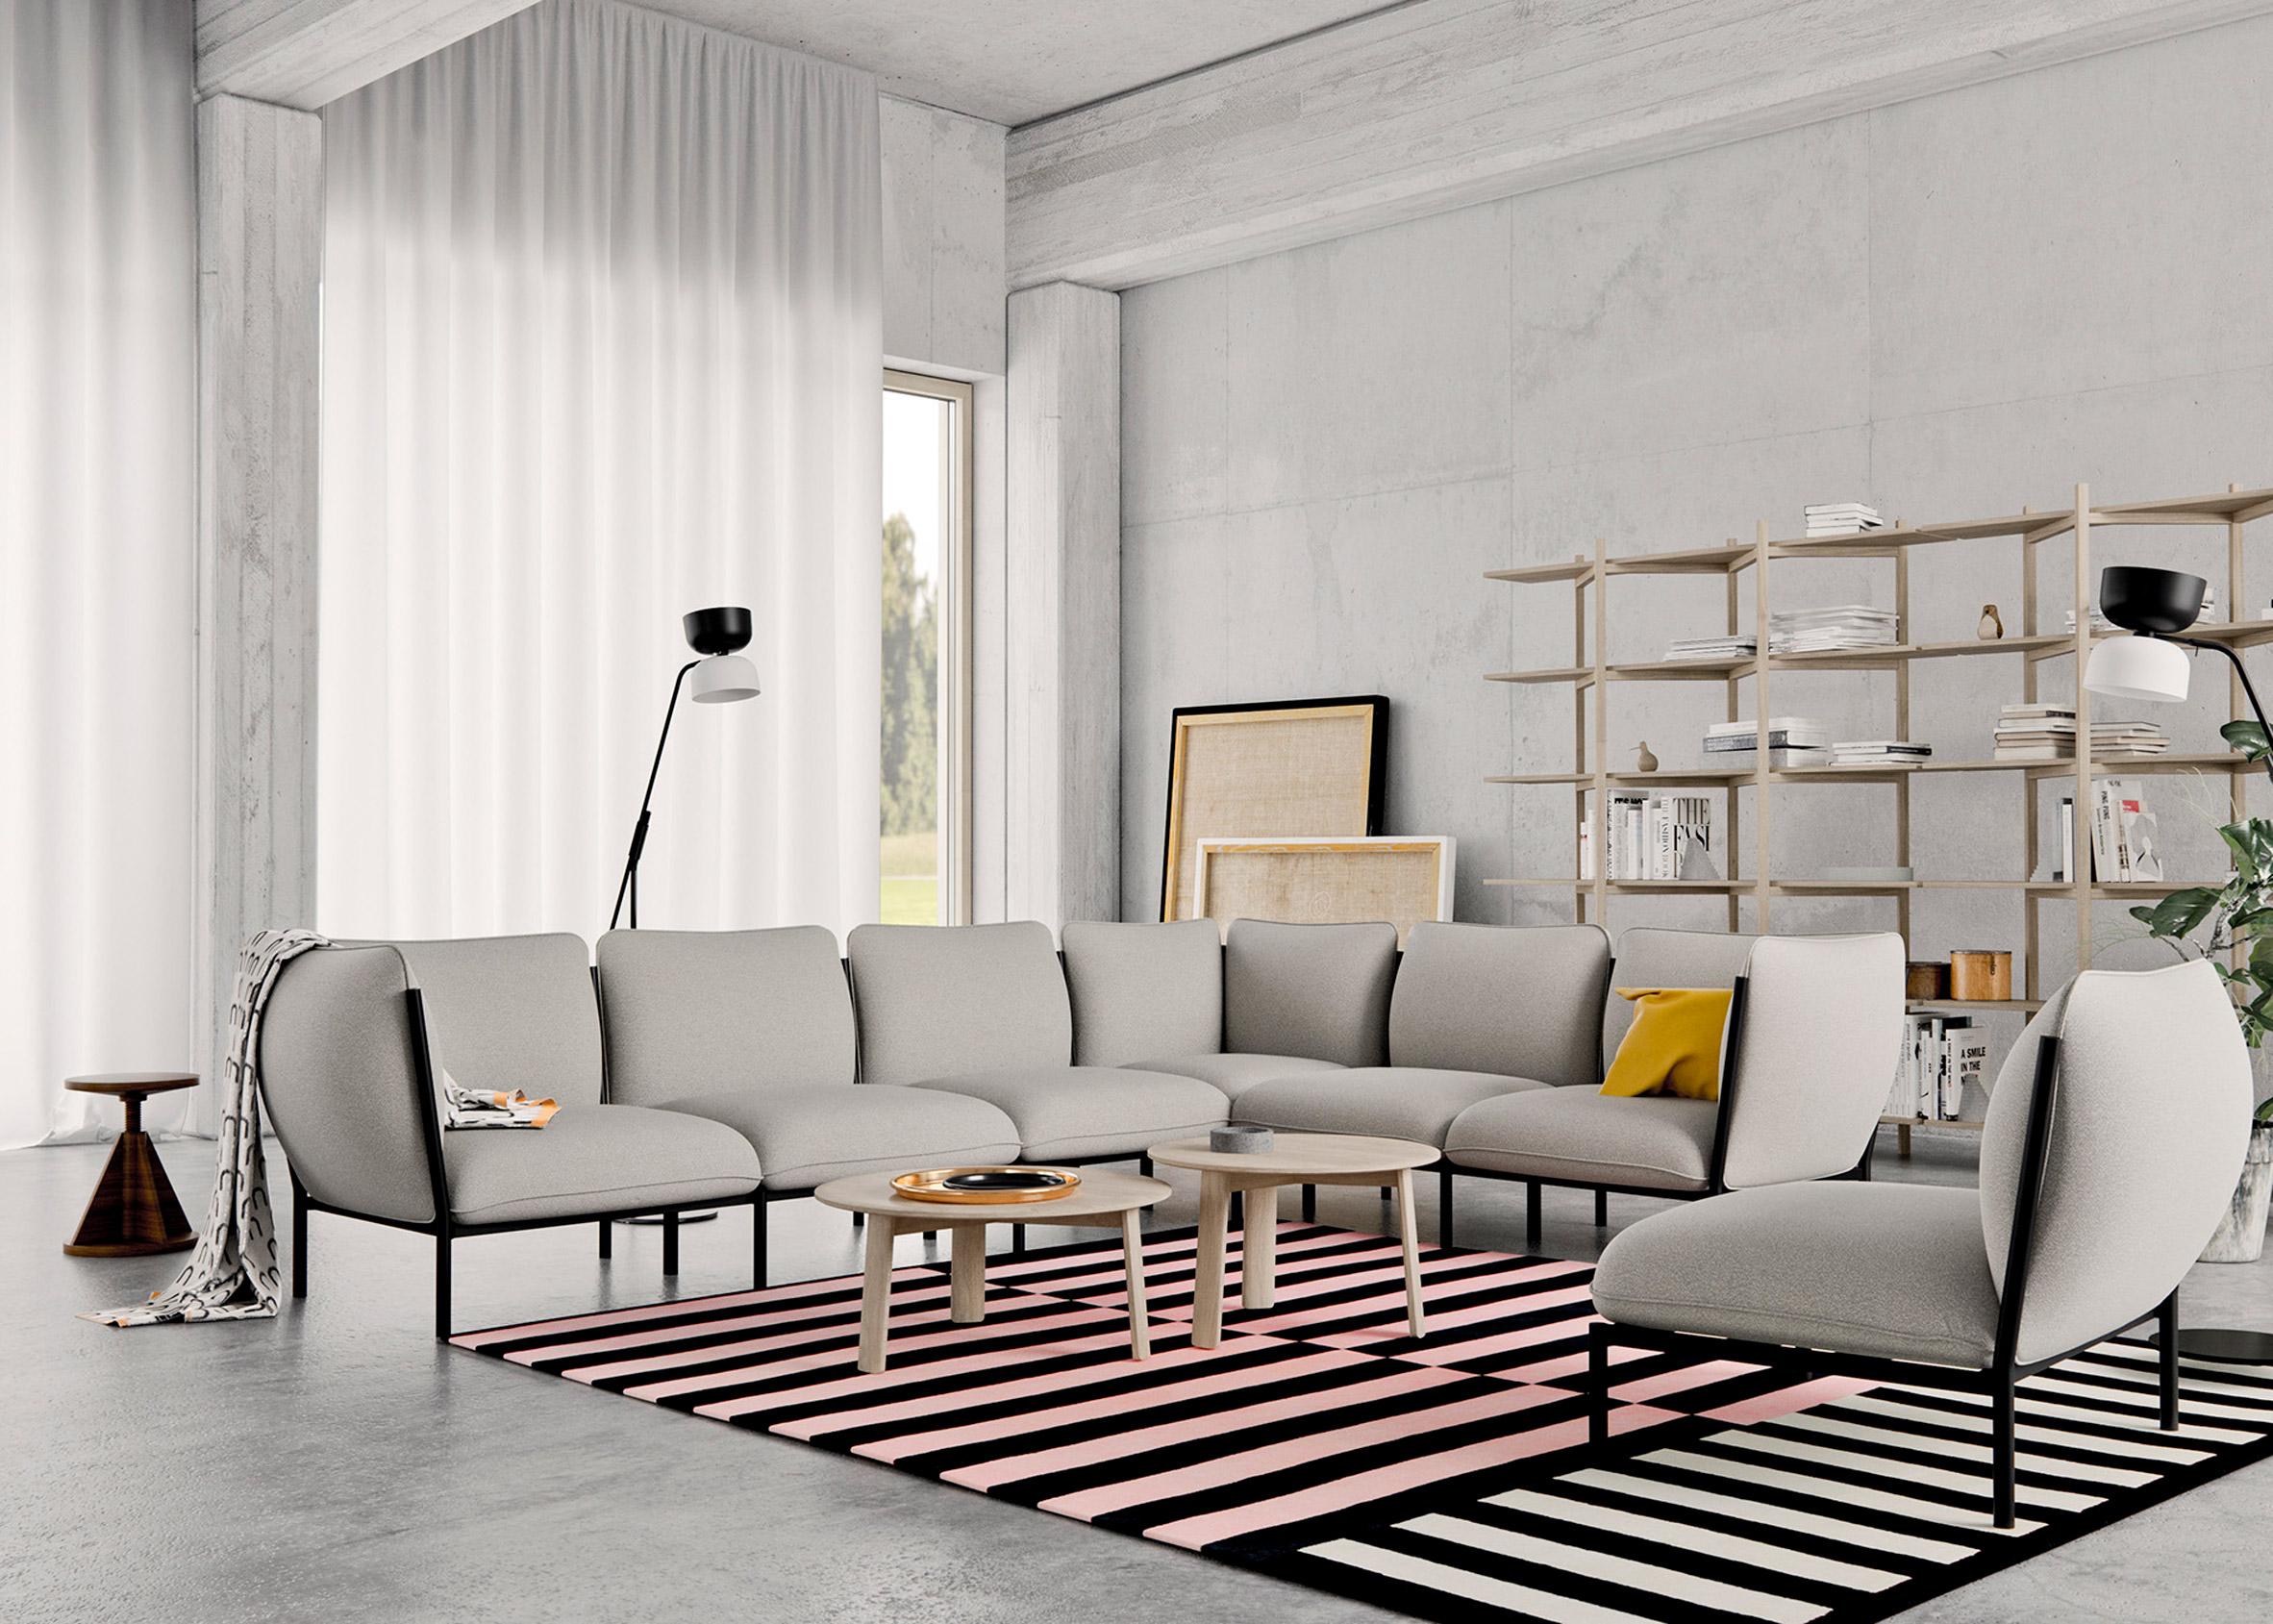 Dezeen Awards design winners: Kumo Modular Sofa by Anderssen & Voll for Hem